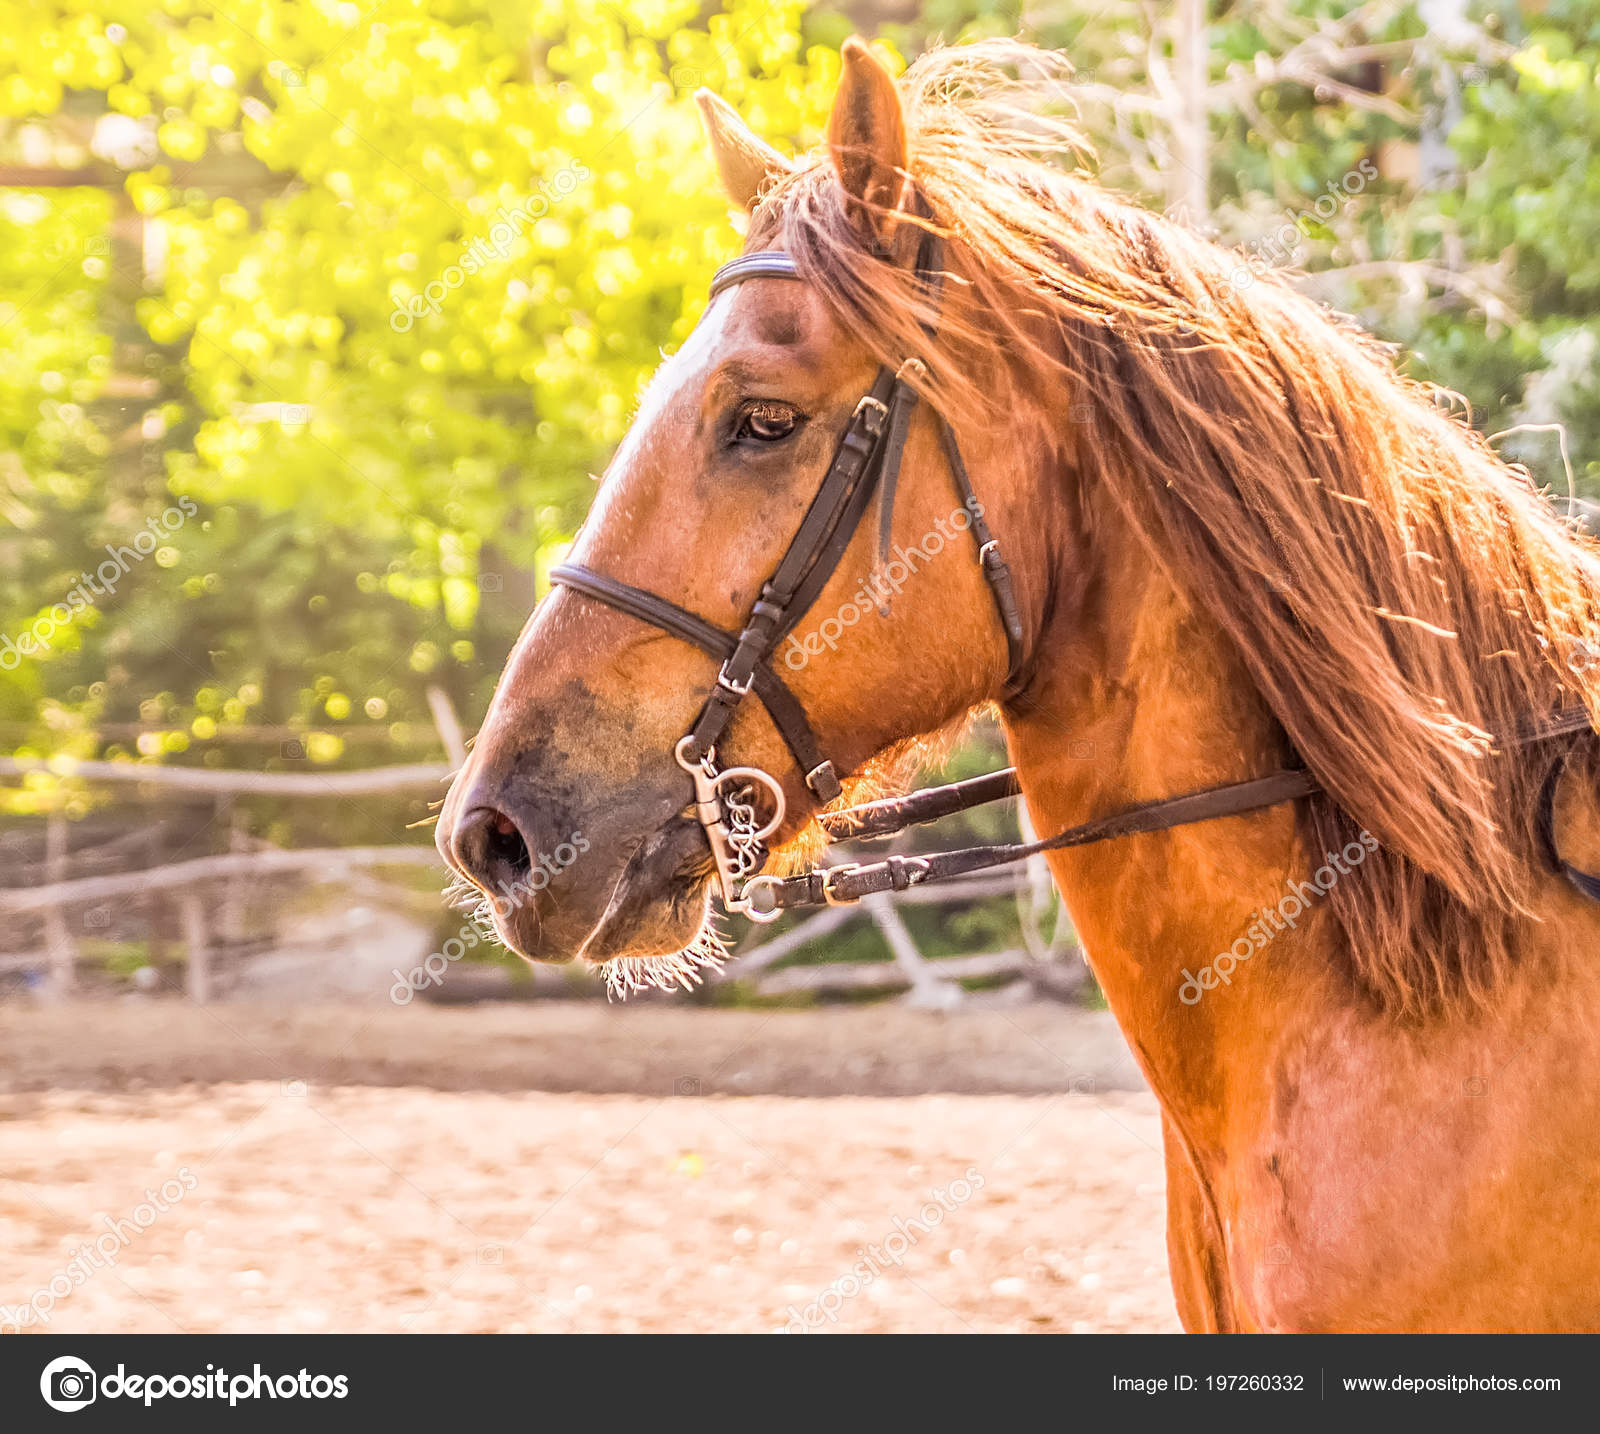 Sorrel Horse Side View Head Shot Bay Stallion Portrait Thoroughbred Stock Photo C Martanovak 197260332